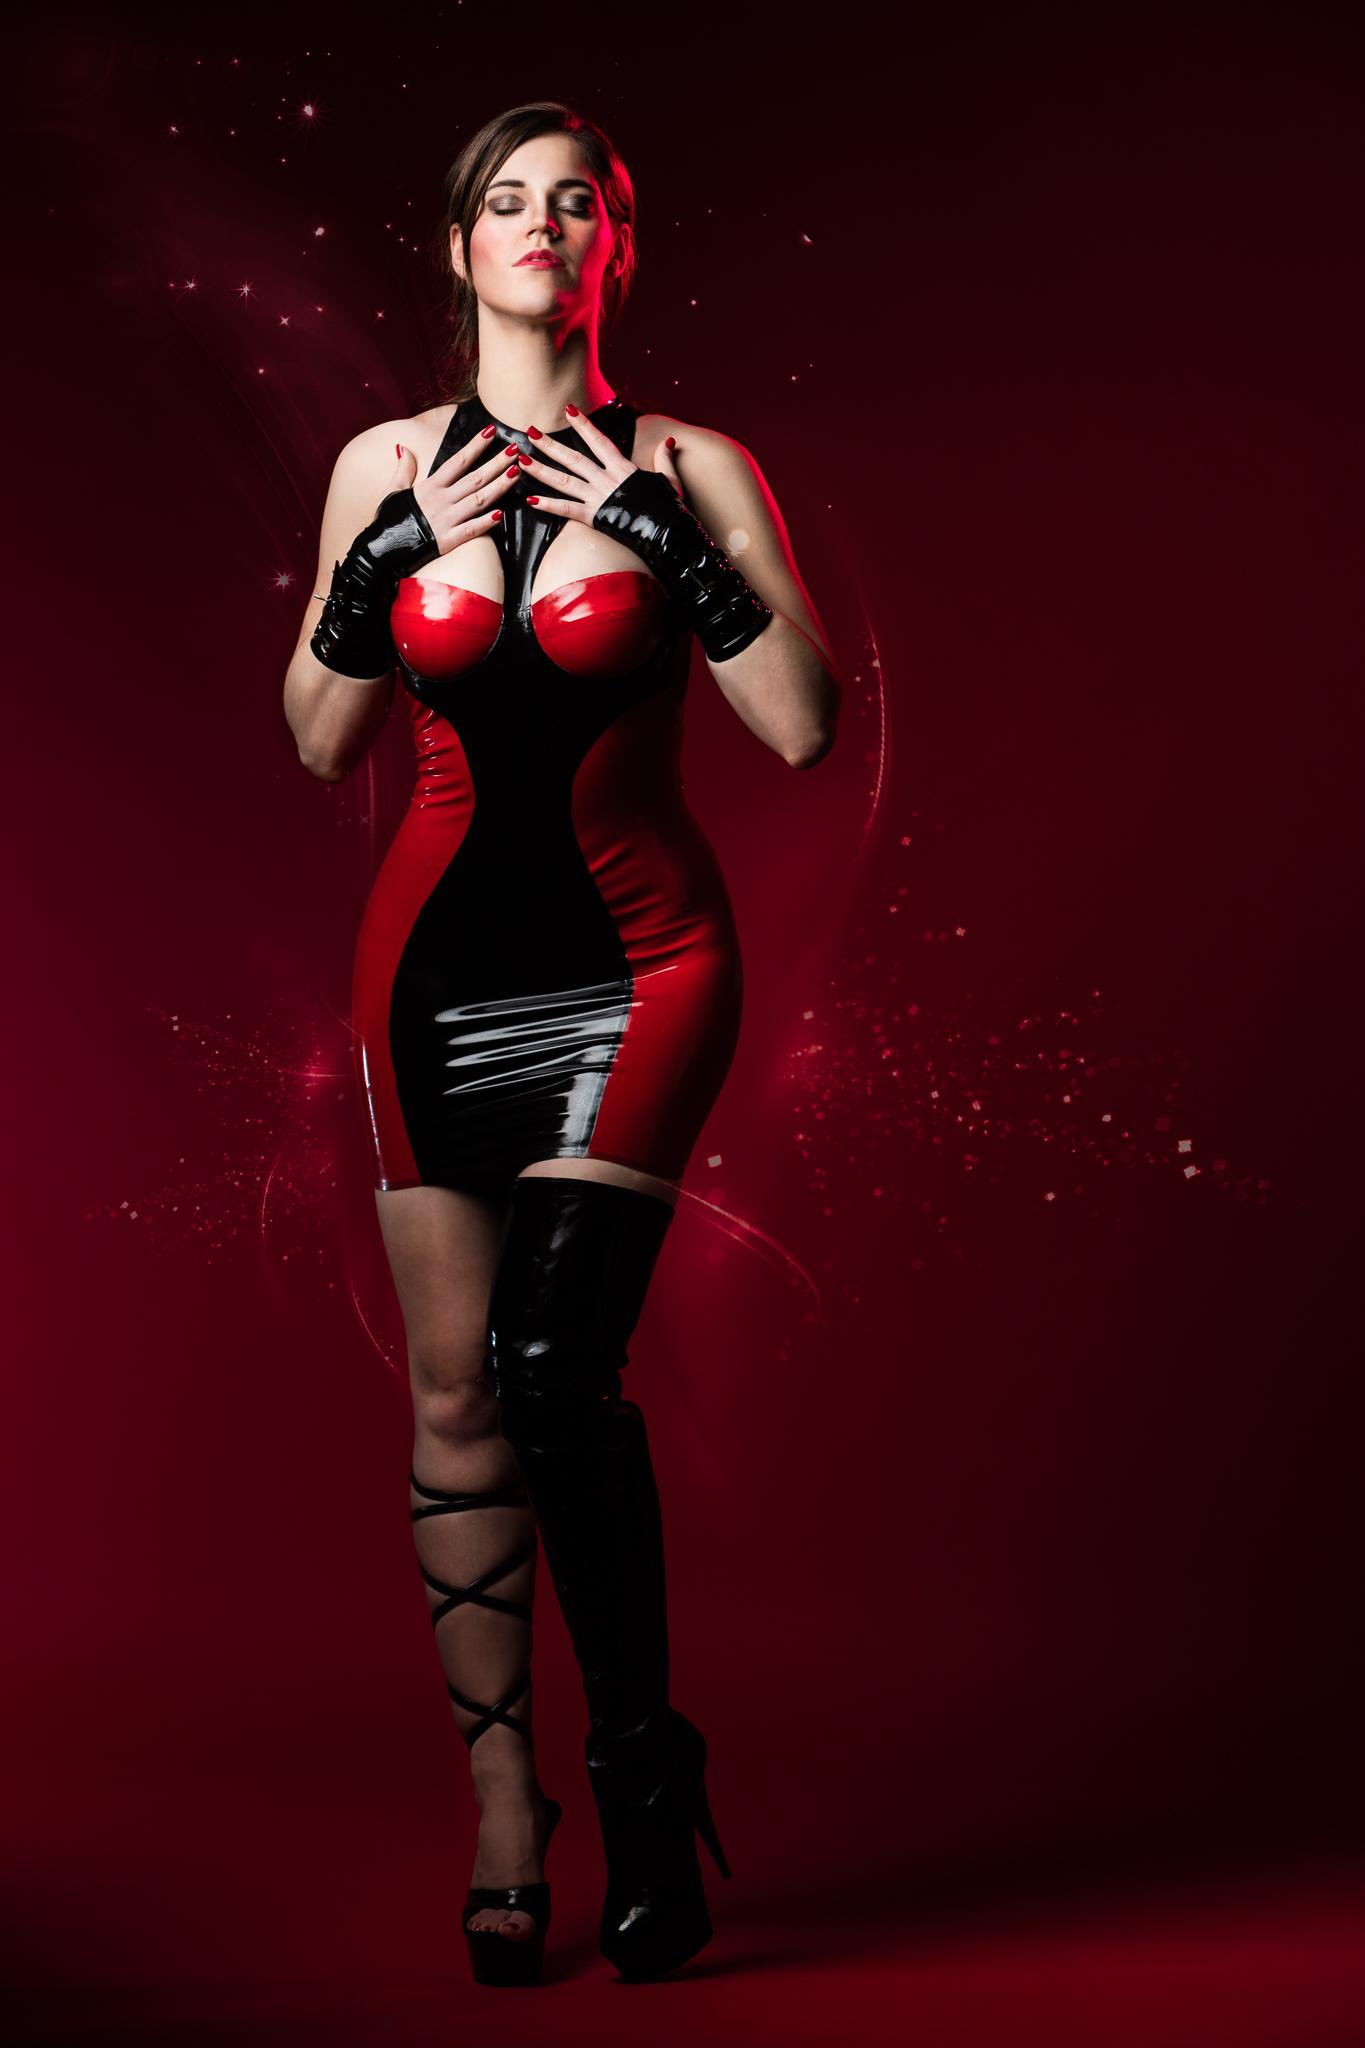 Sara Sparkles in a Mademoiselle Ilo Latex Dress